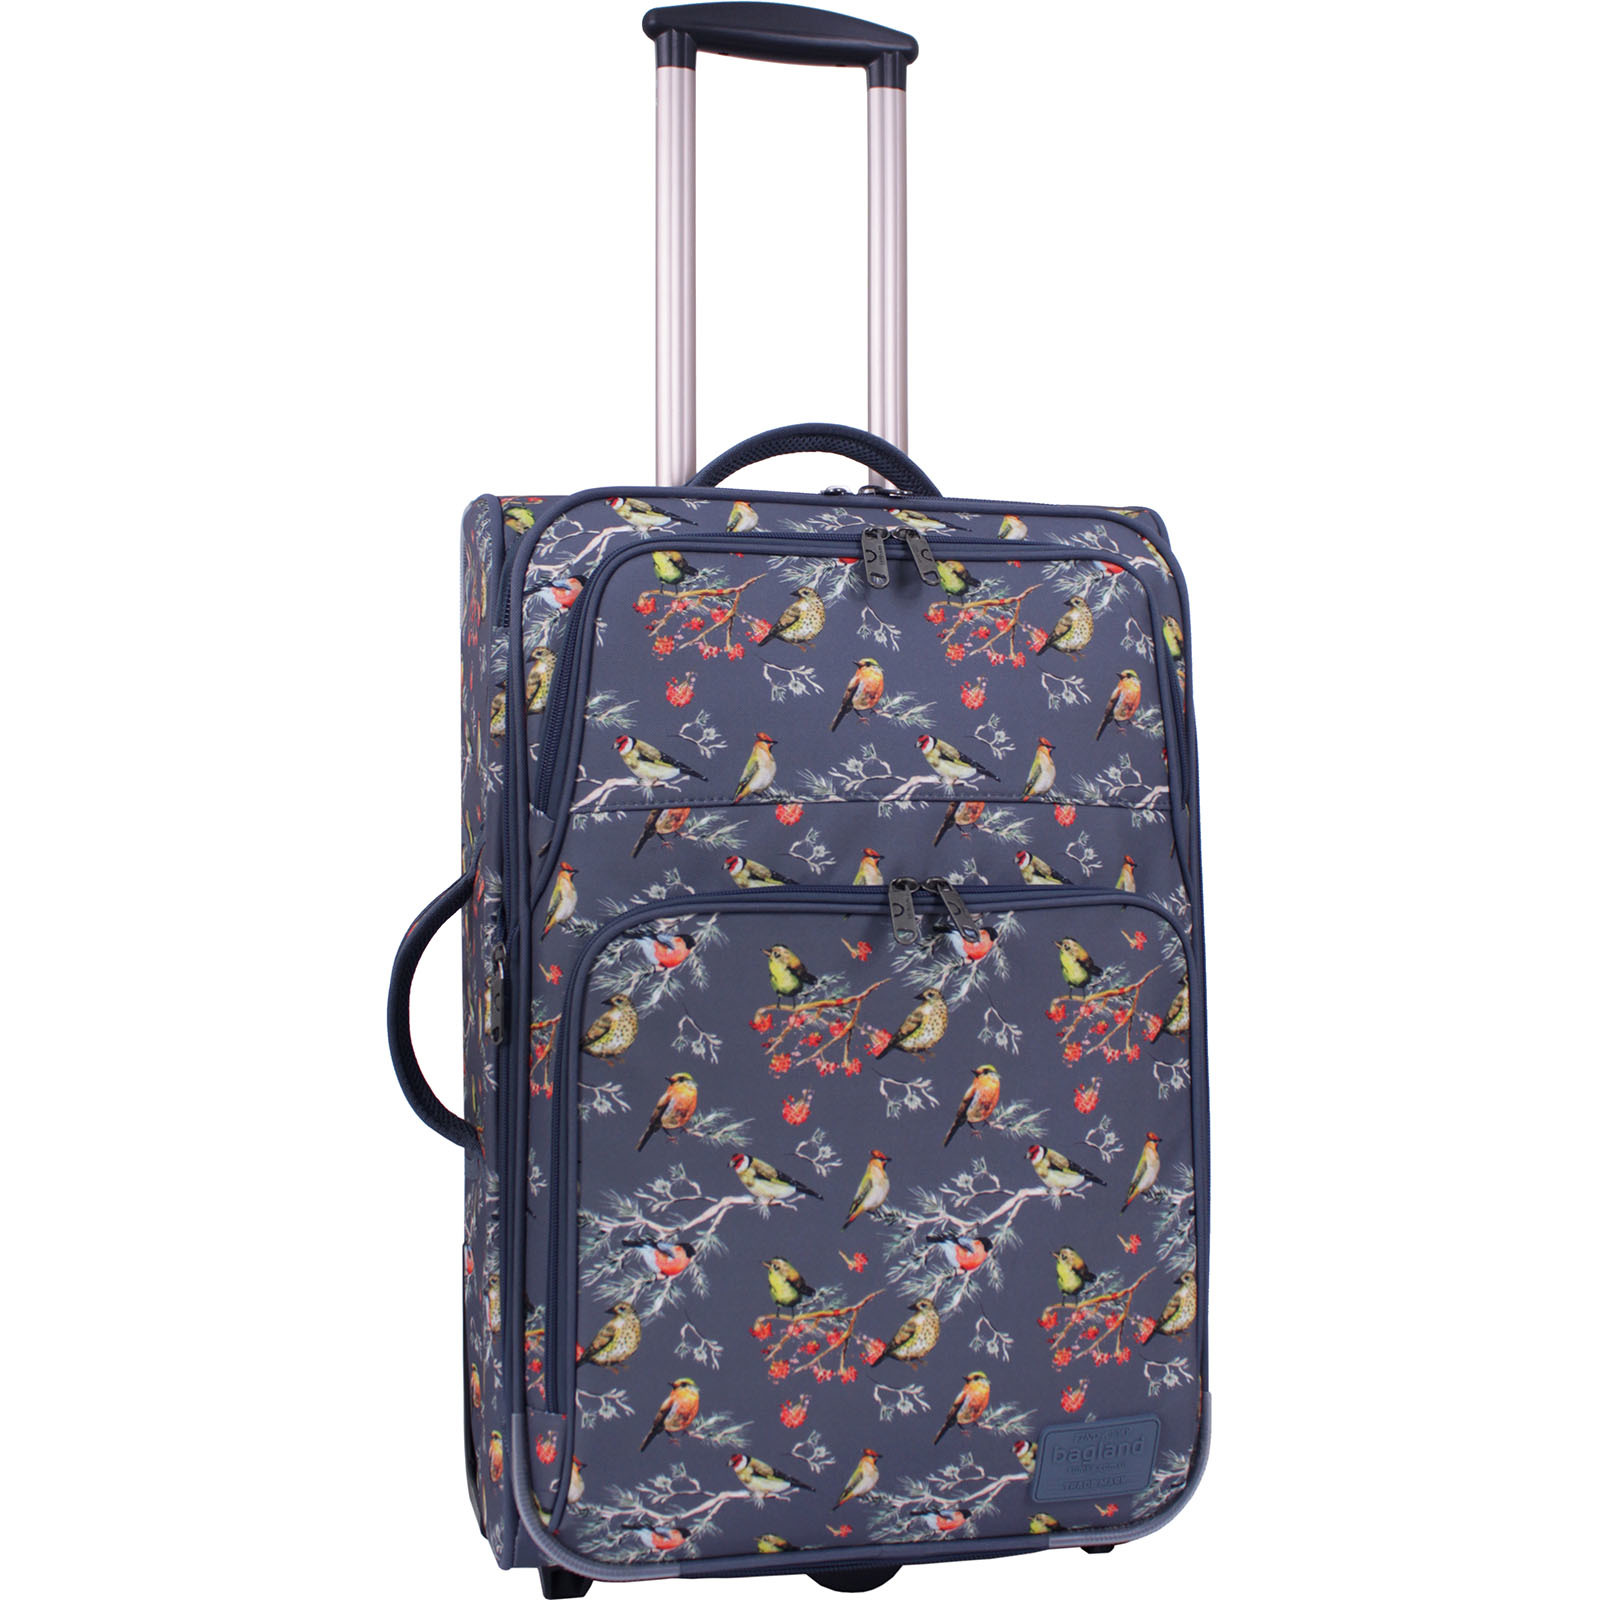 Дорожные чемоданы Чемодан Bagland Леон средний дизайн 51 л. сублімація 445 (0037666244) IMG_4841_суб.446_.JPG